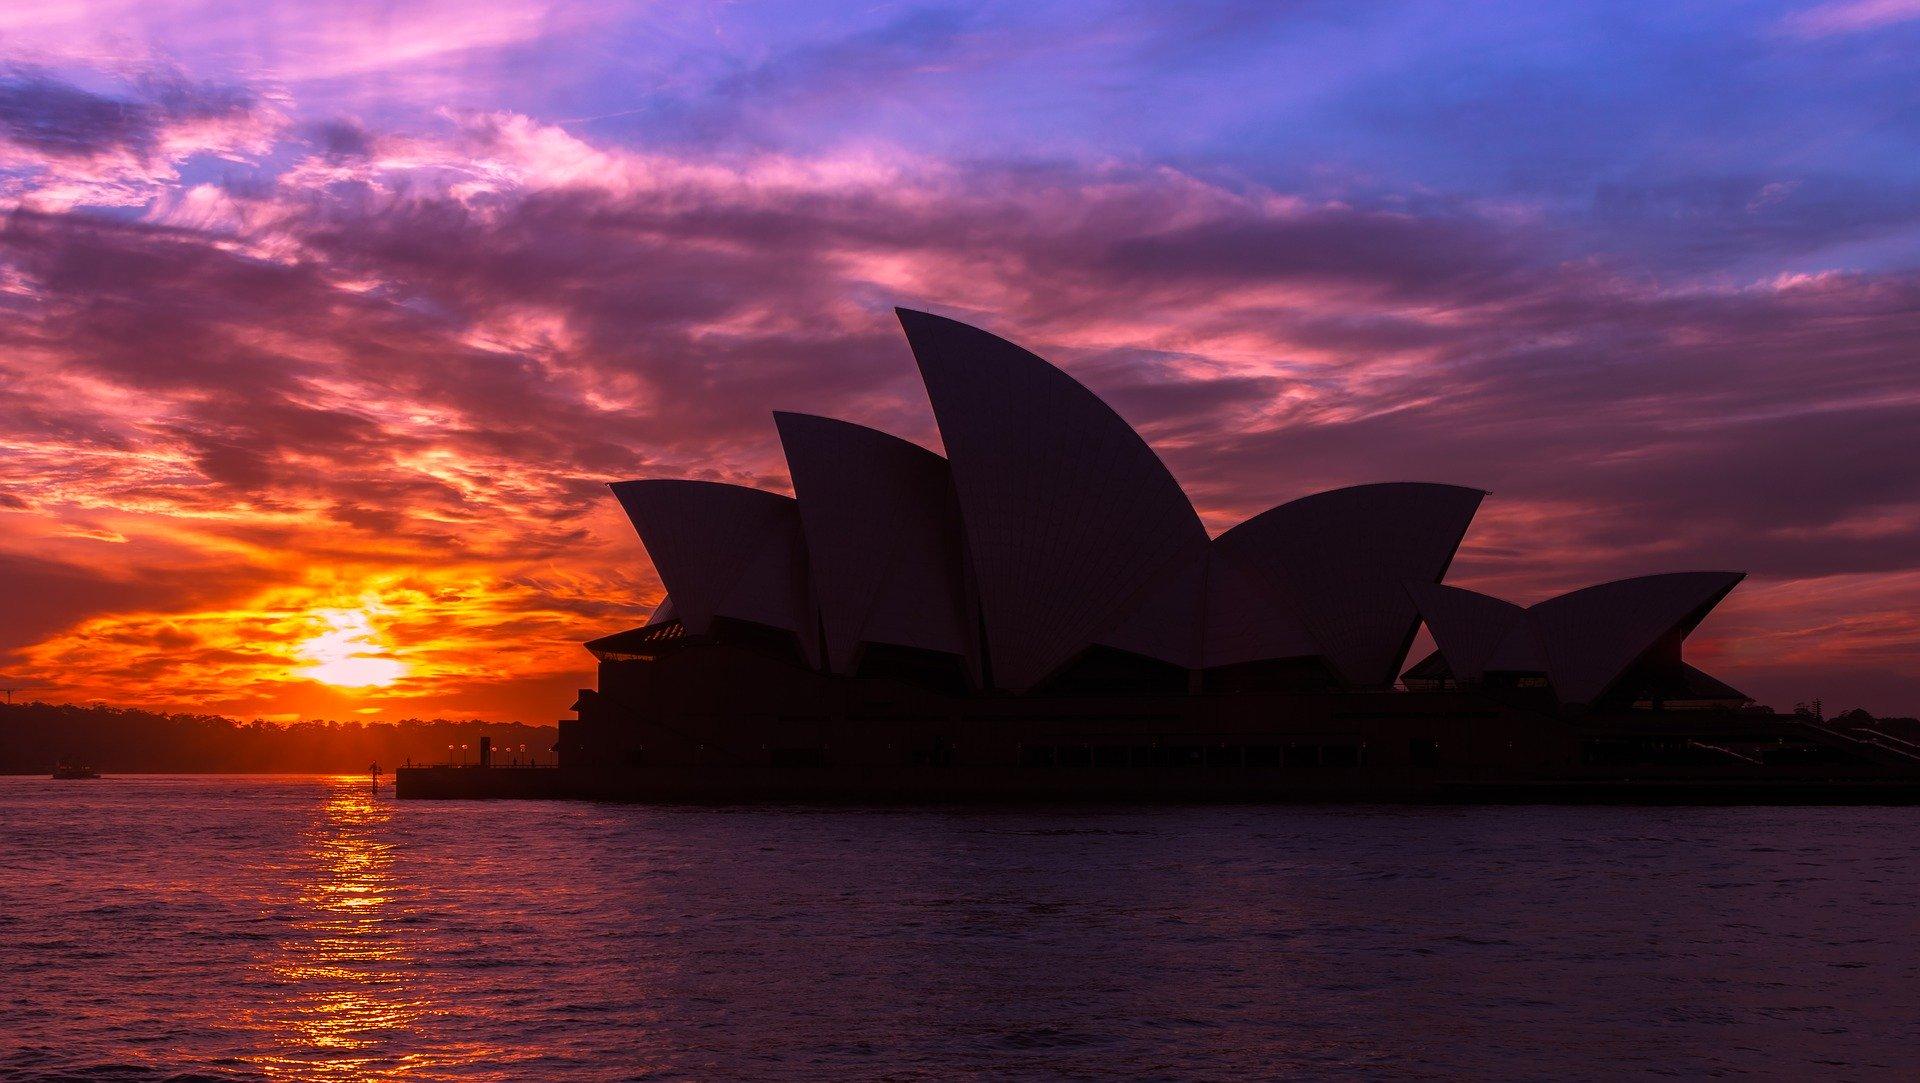 Travel to Icconic Australia New Zealand With Fiji from Surat - Gujarat